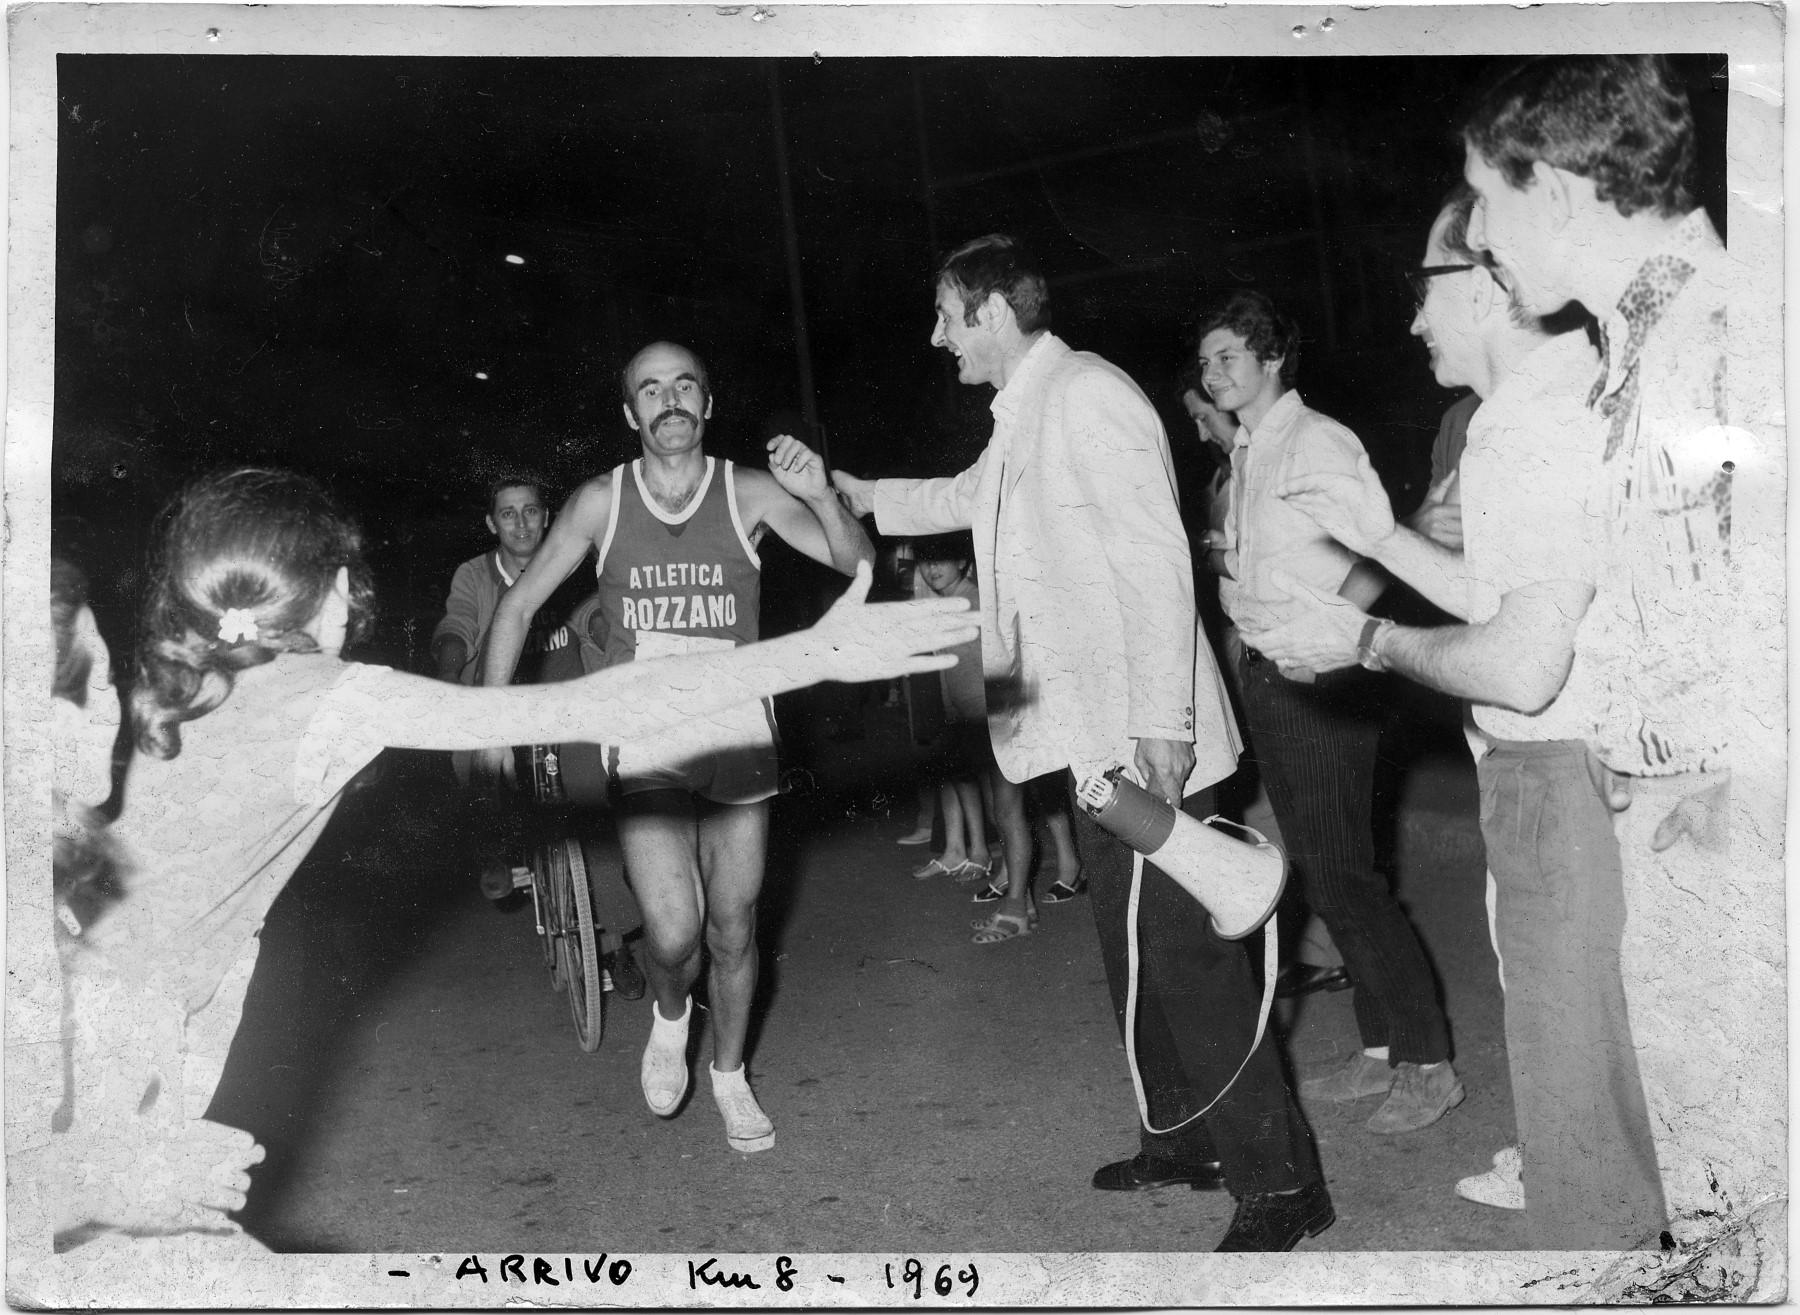 La Corsa 1969